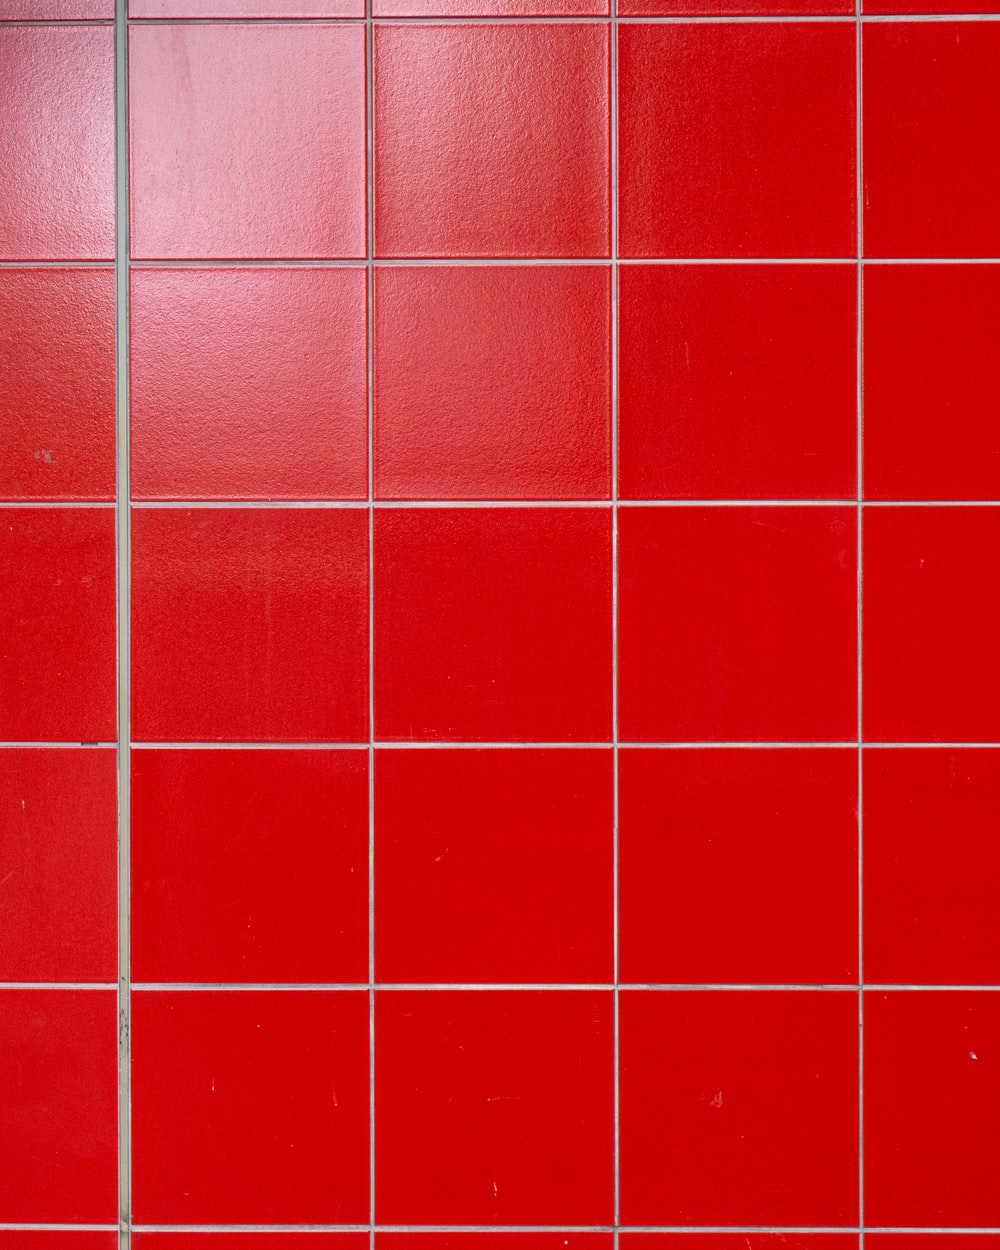 green and white ceramic tiles